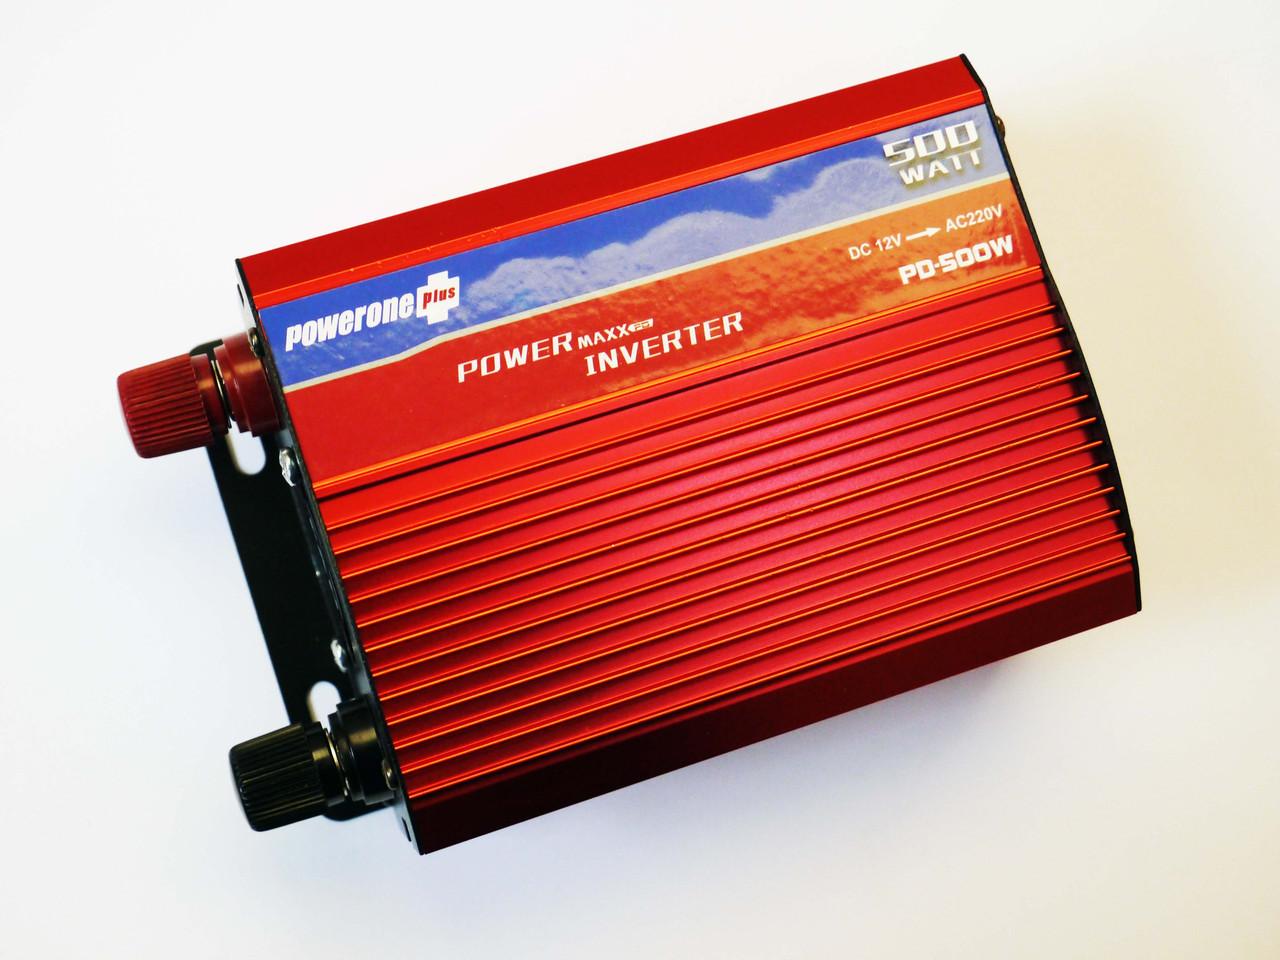 Инвертор 500W 12V с вольтметром Powerone